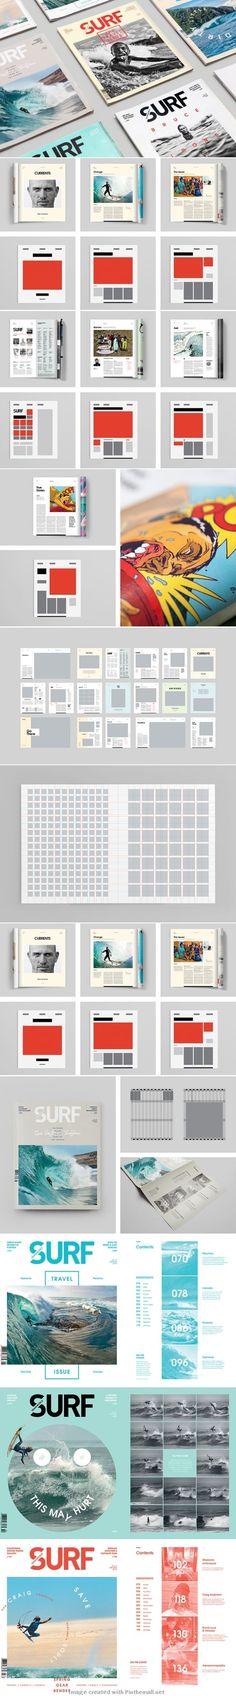 Surf magazine grid layout by Margarita Bernal